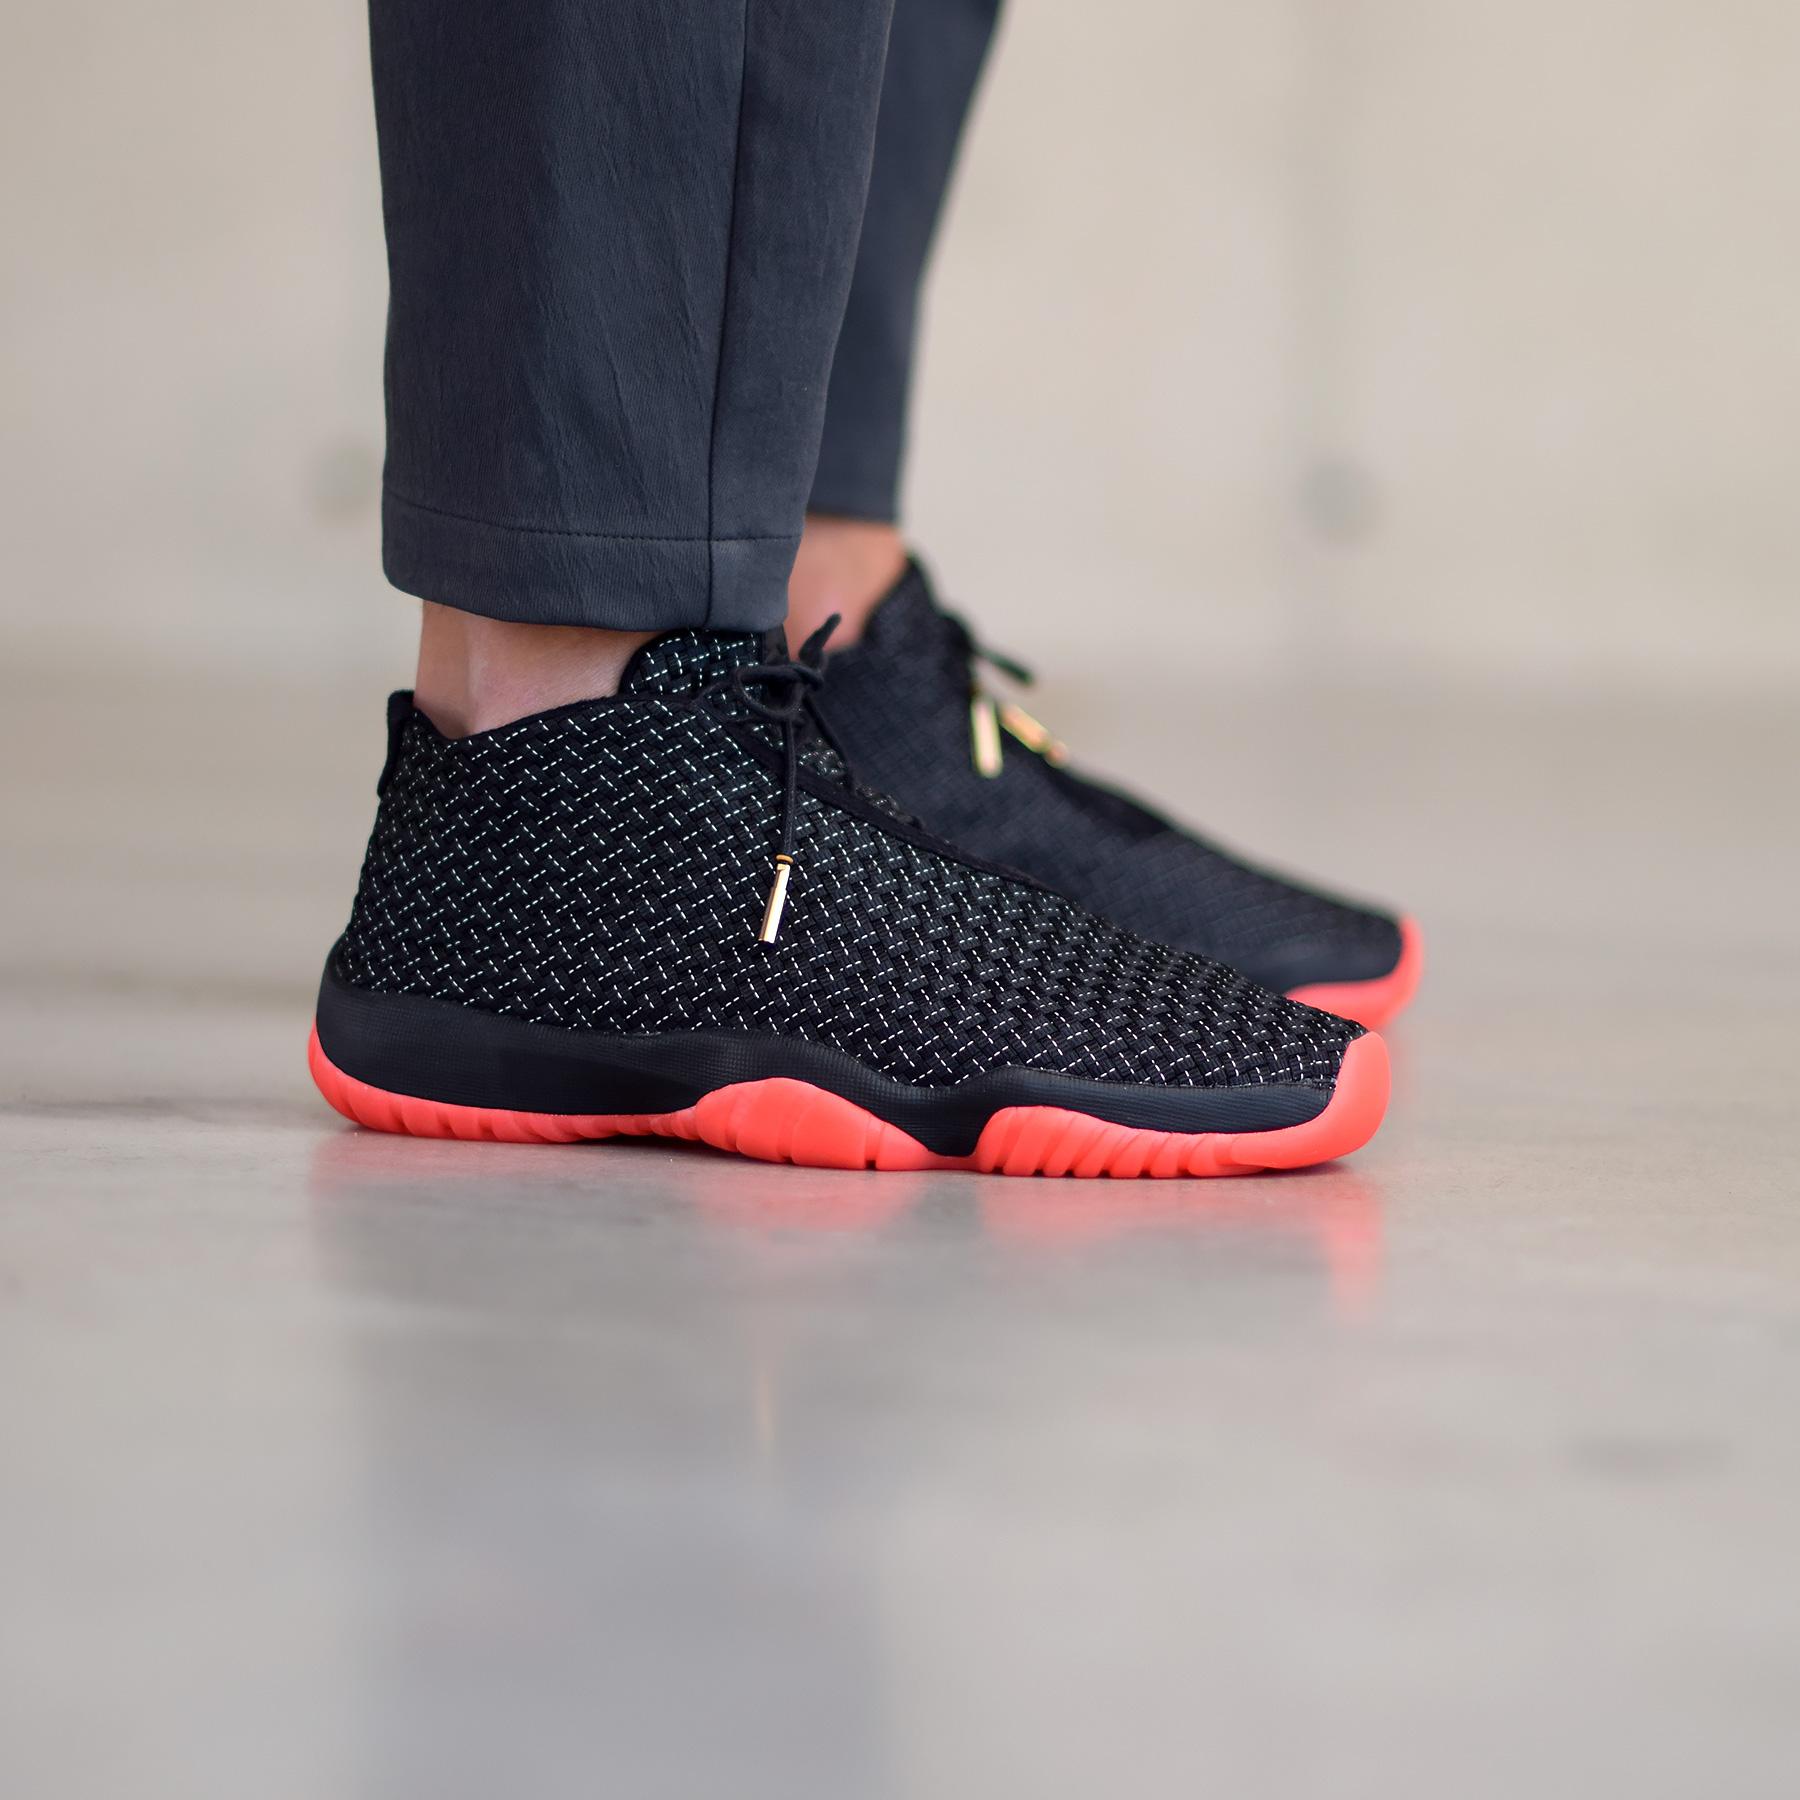 differently 52fd3 f1a2a L Air Jordan Future Premium est de retour.